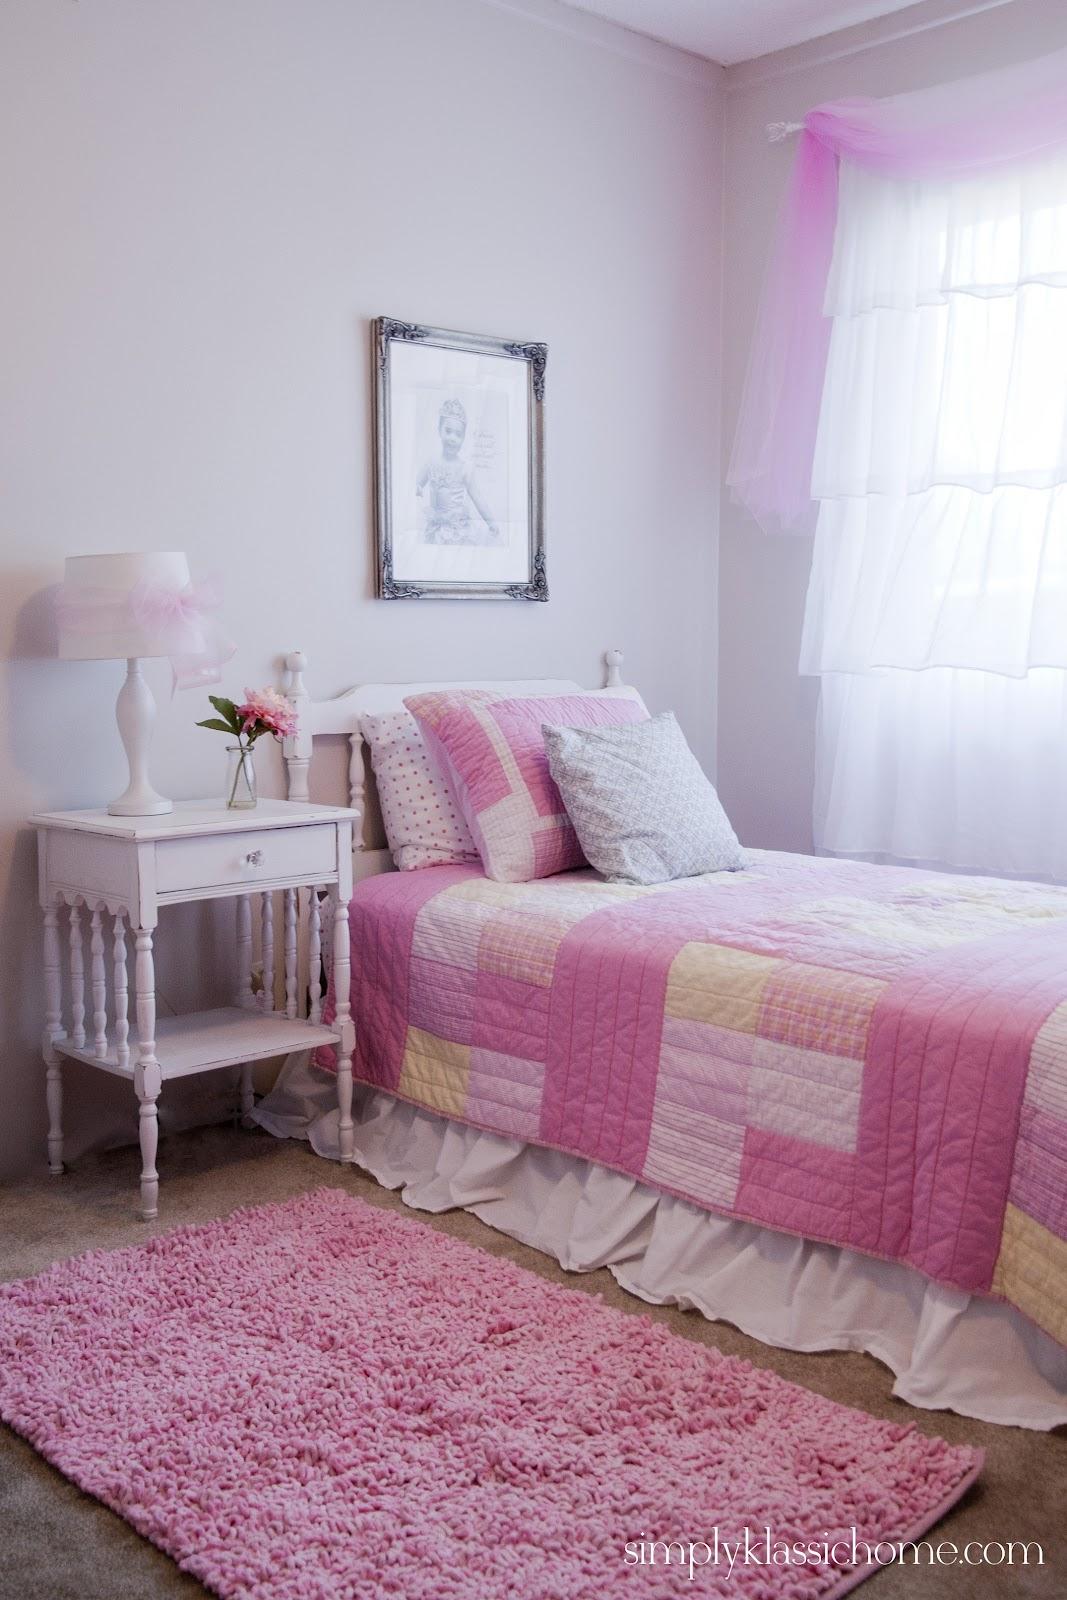 Uncategorized Little Girl Princess Room Ideas little girls princess room makeover reveal yellow bliss road reveal